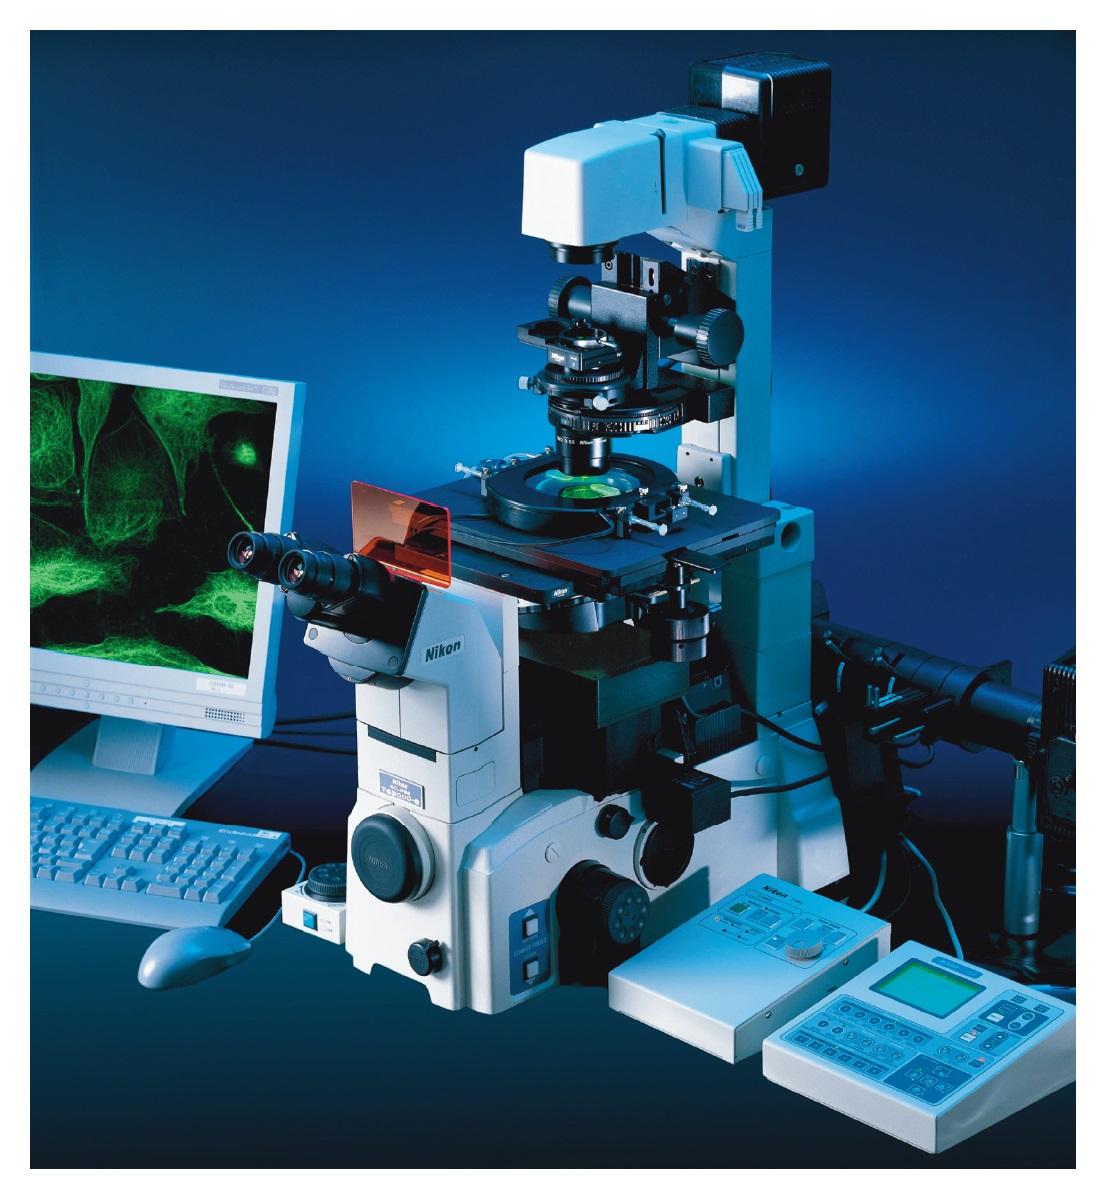 Figure 2 Nikon Microscope in the lab, digital imaging example